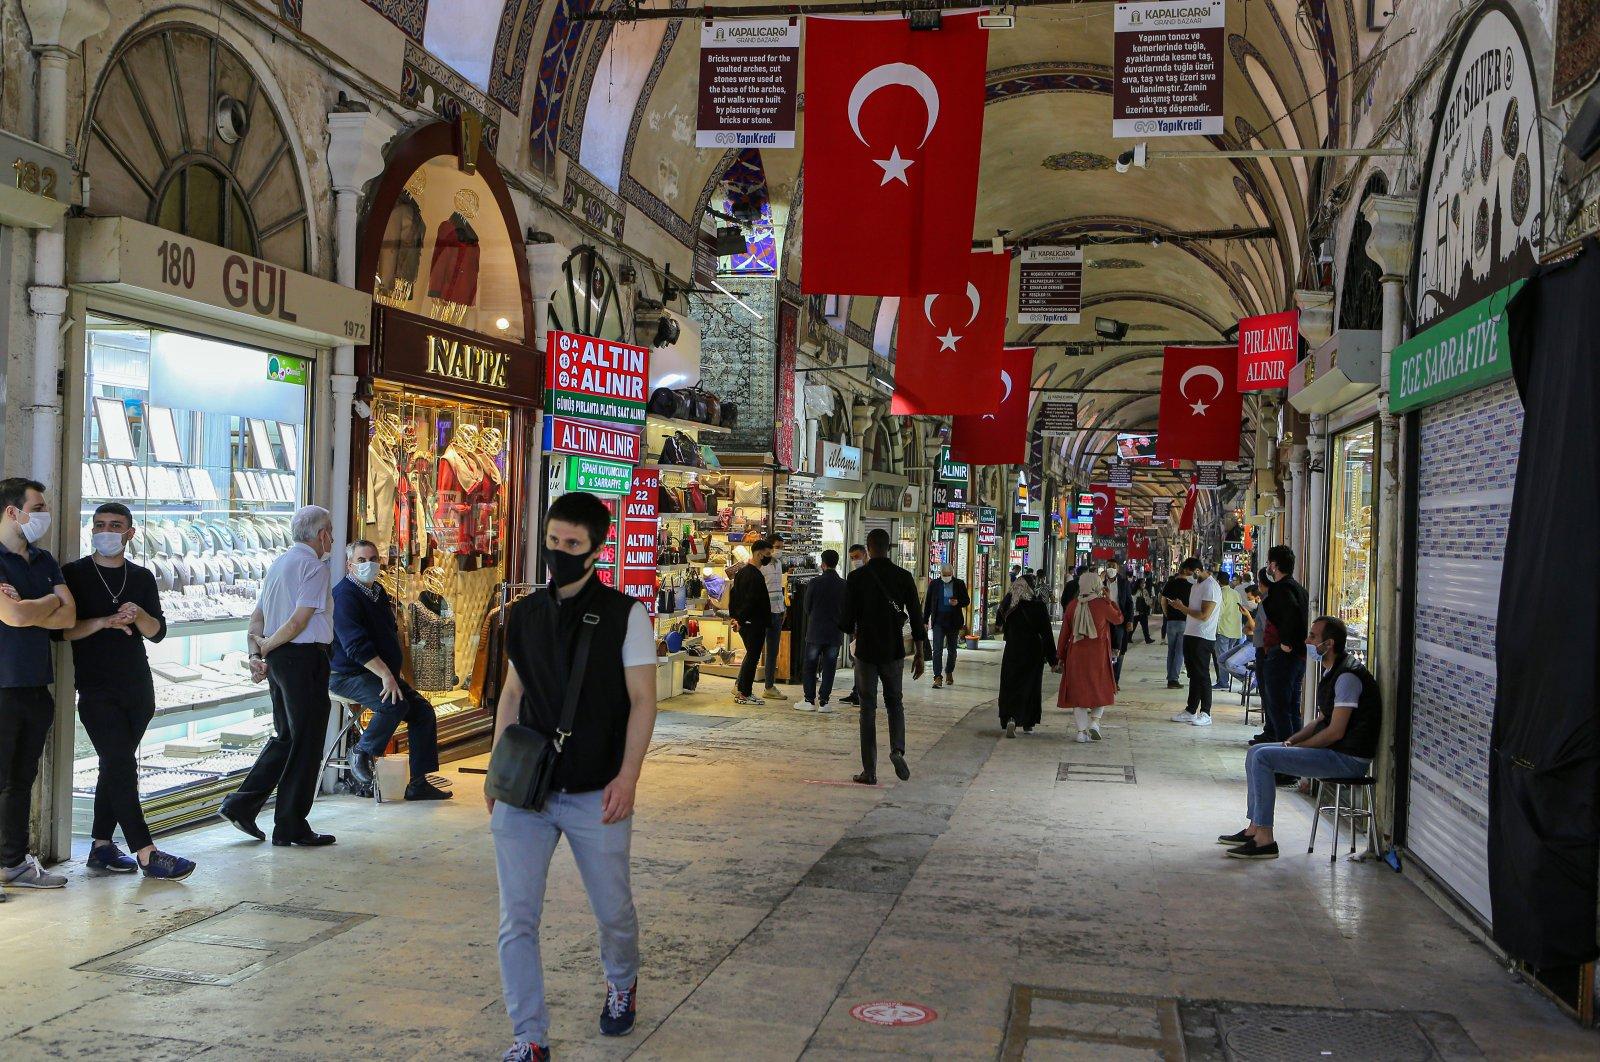 People wearing masks walk in Istanbul's historic Grand Bazaar, Istanbul, June 4, 2020. (AA)